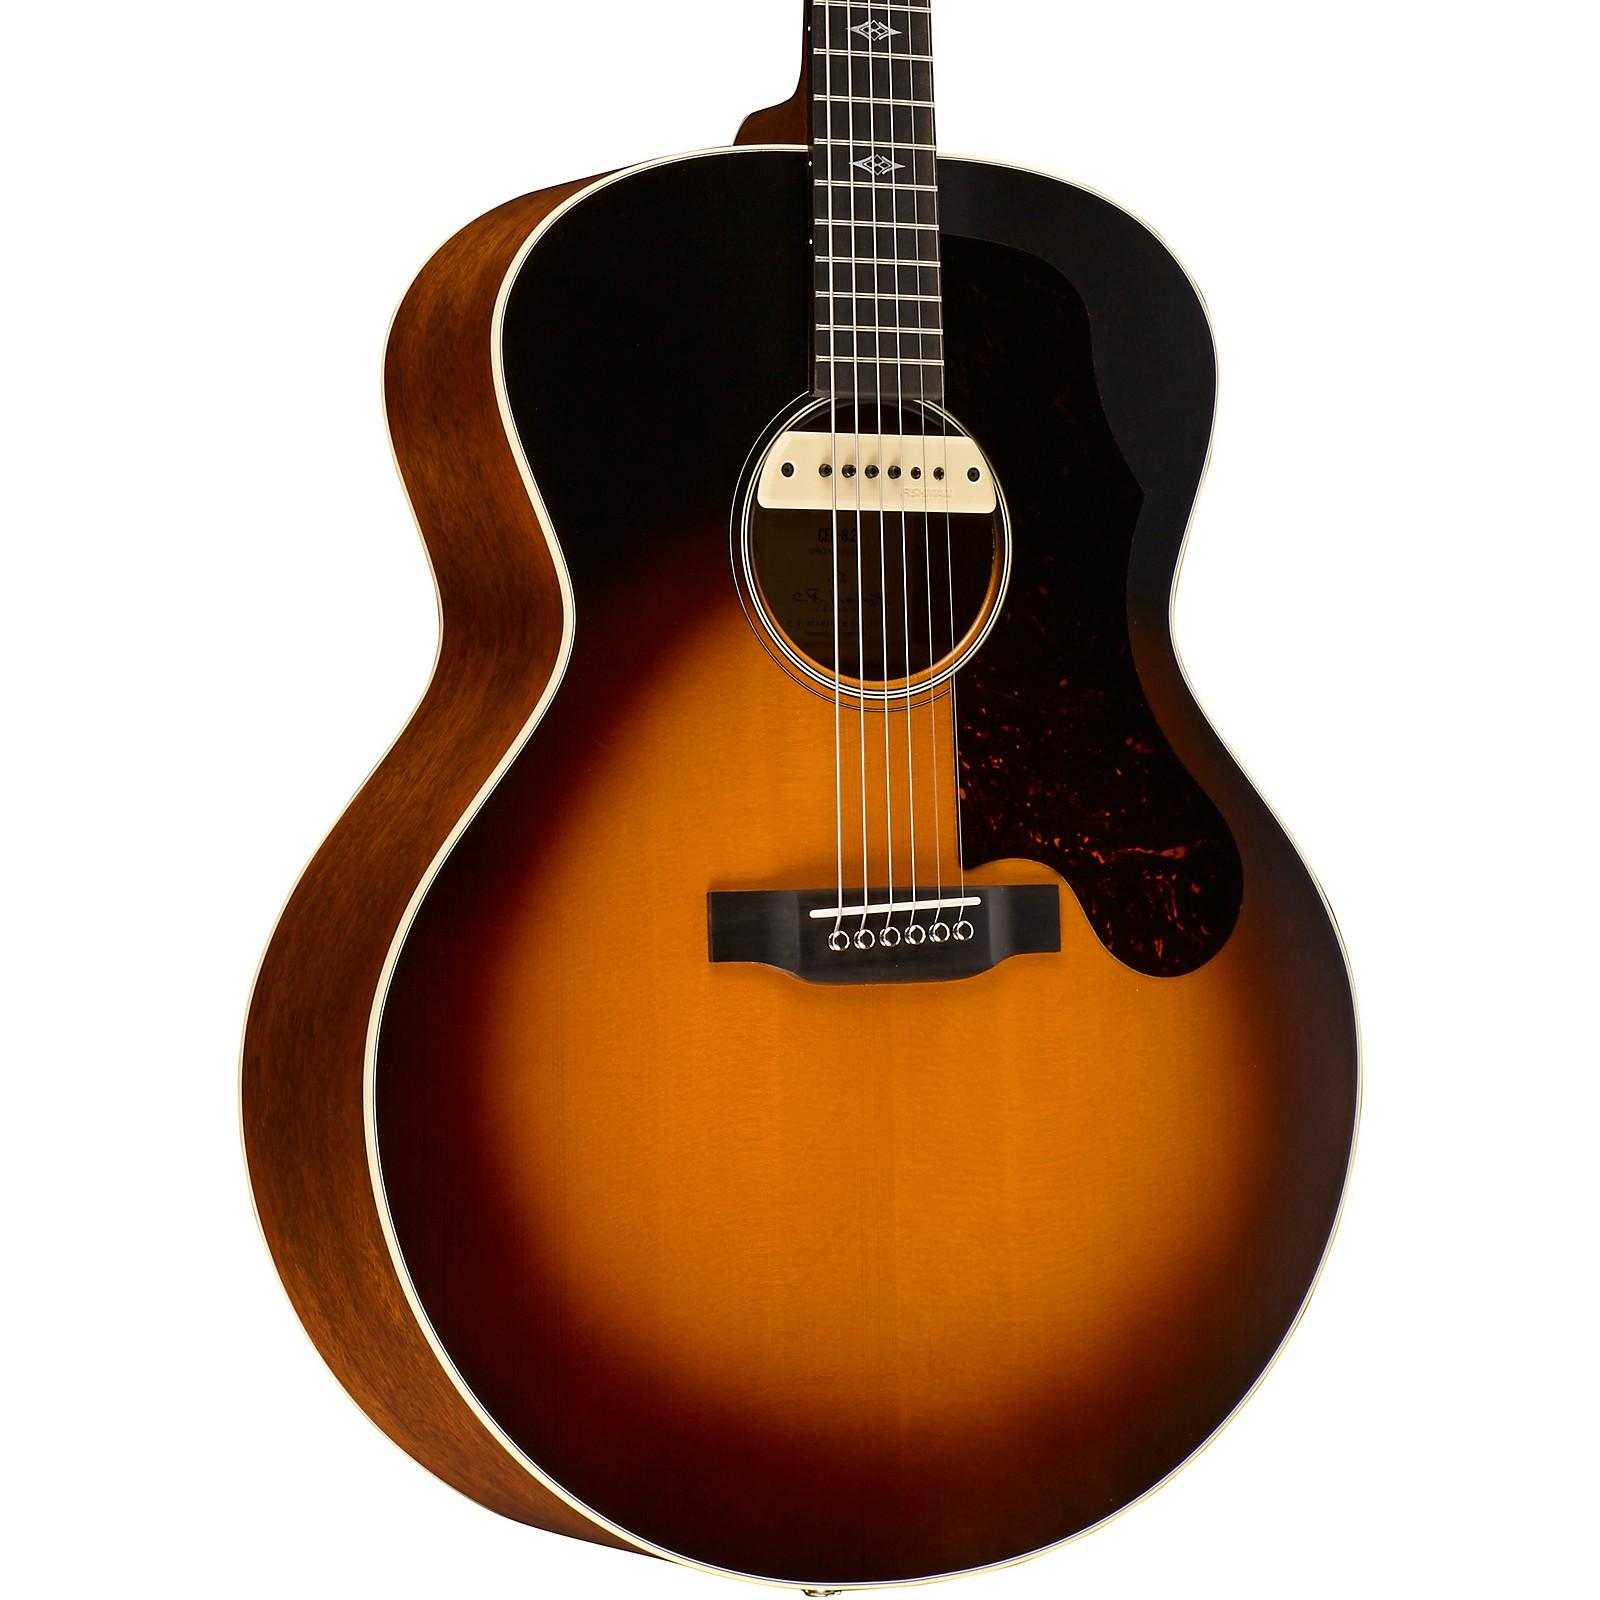 Martin CEO 8.2E Acoustic-Electric Guitar